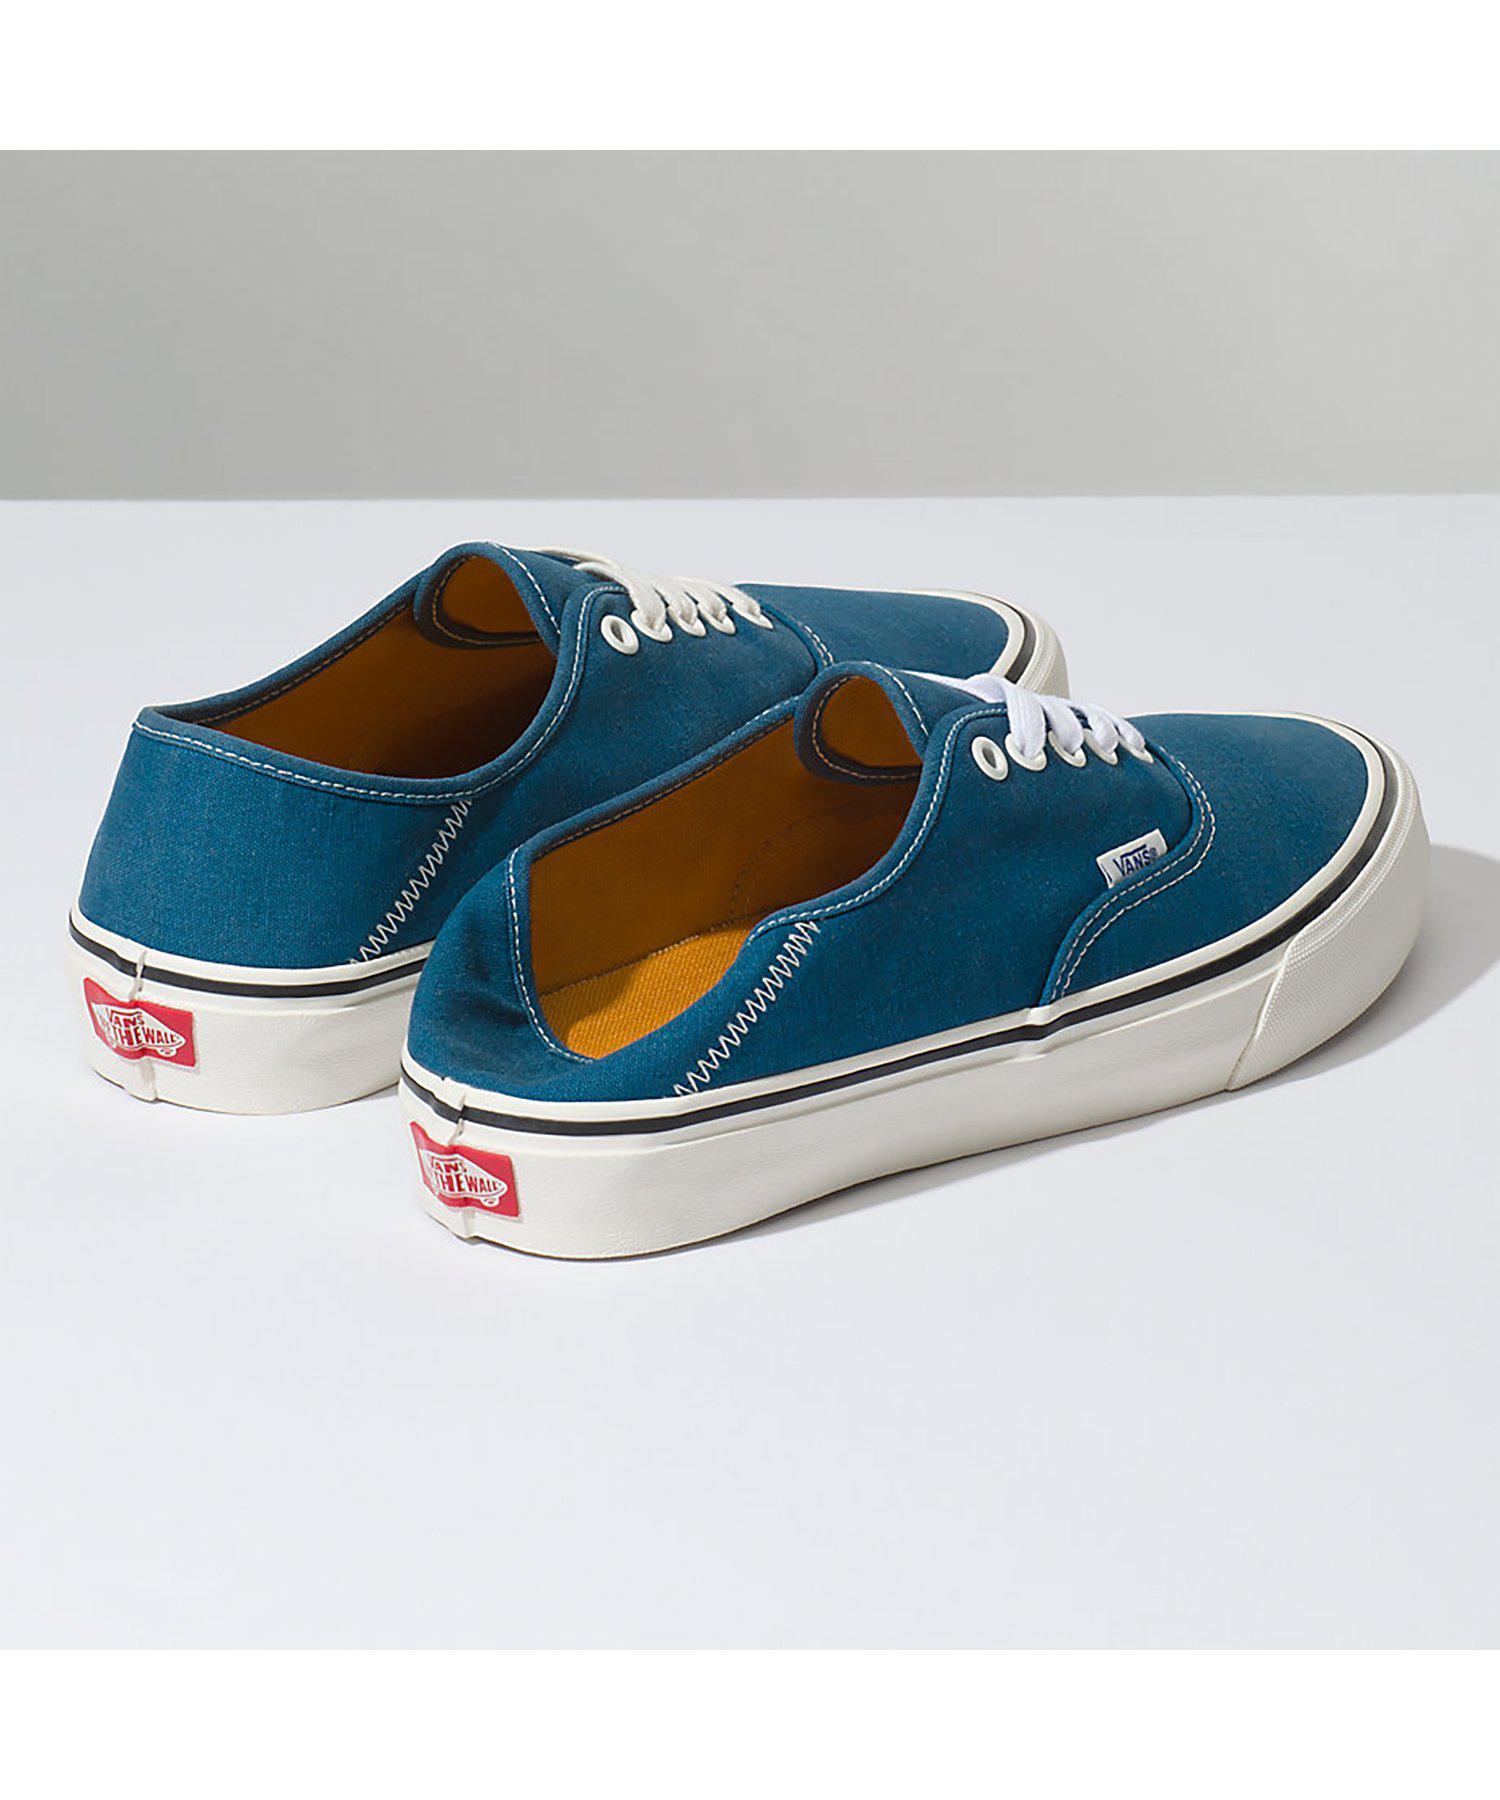 b1e1a8bf1d640f Lyst - Vans Salt Wash Authentic In Corsair in Blue for Men